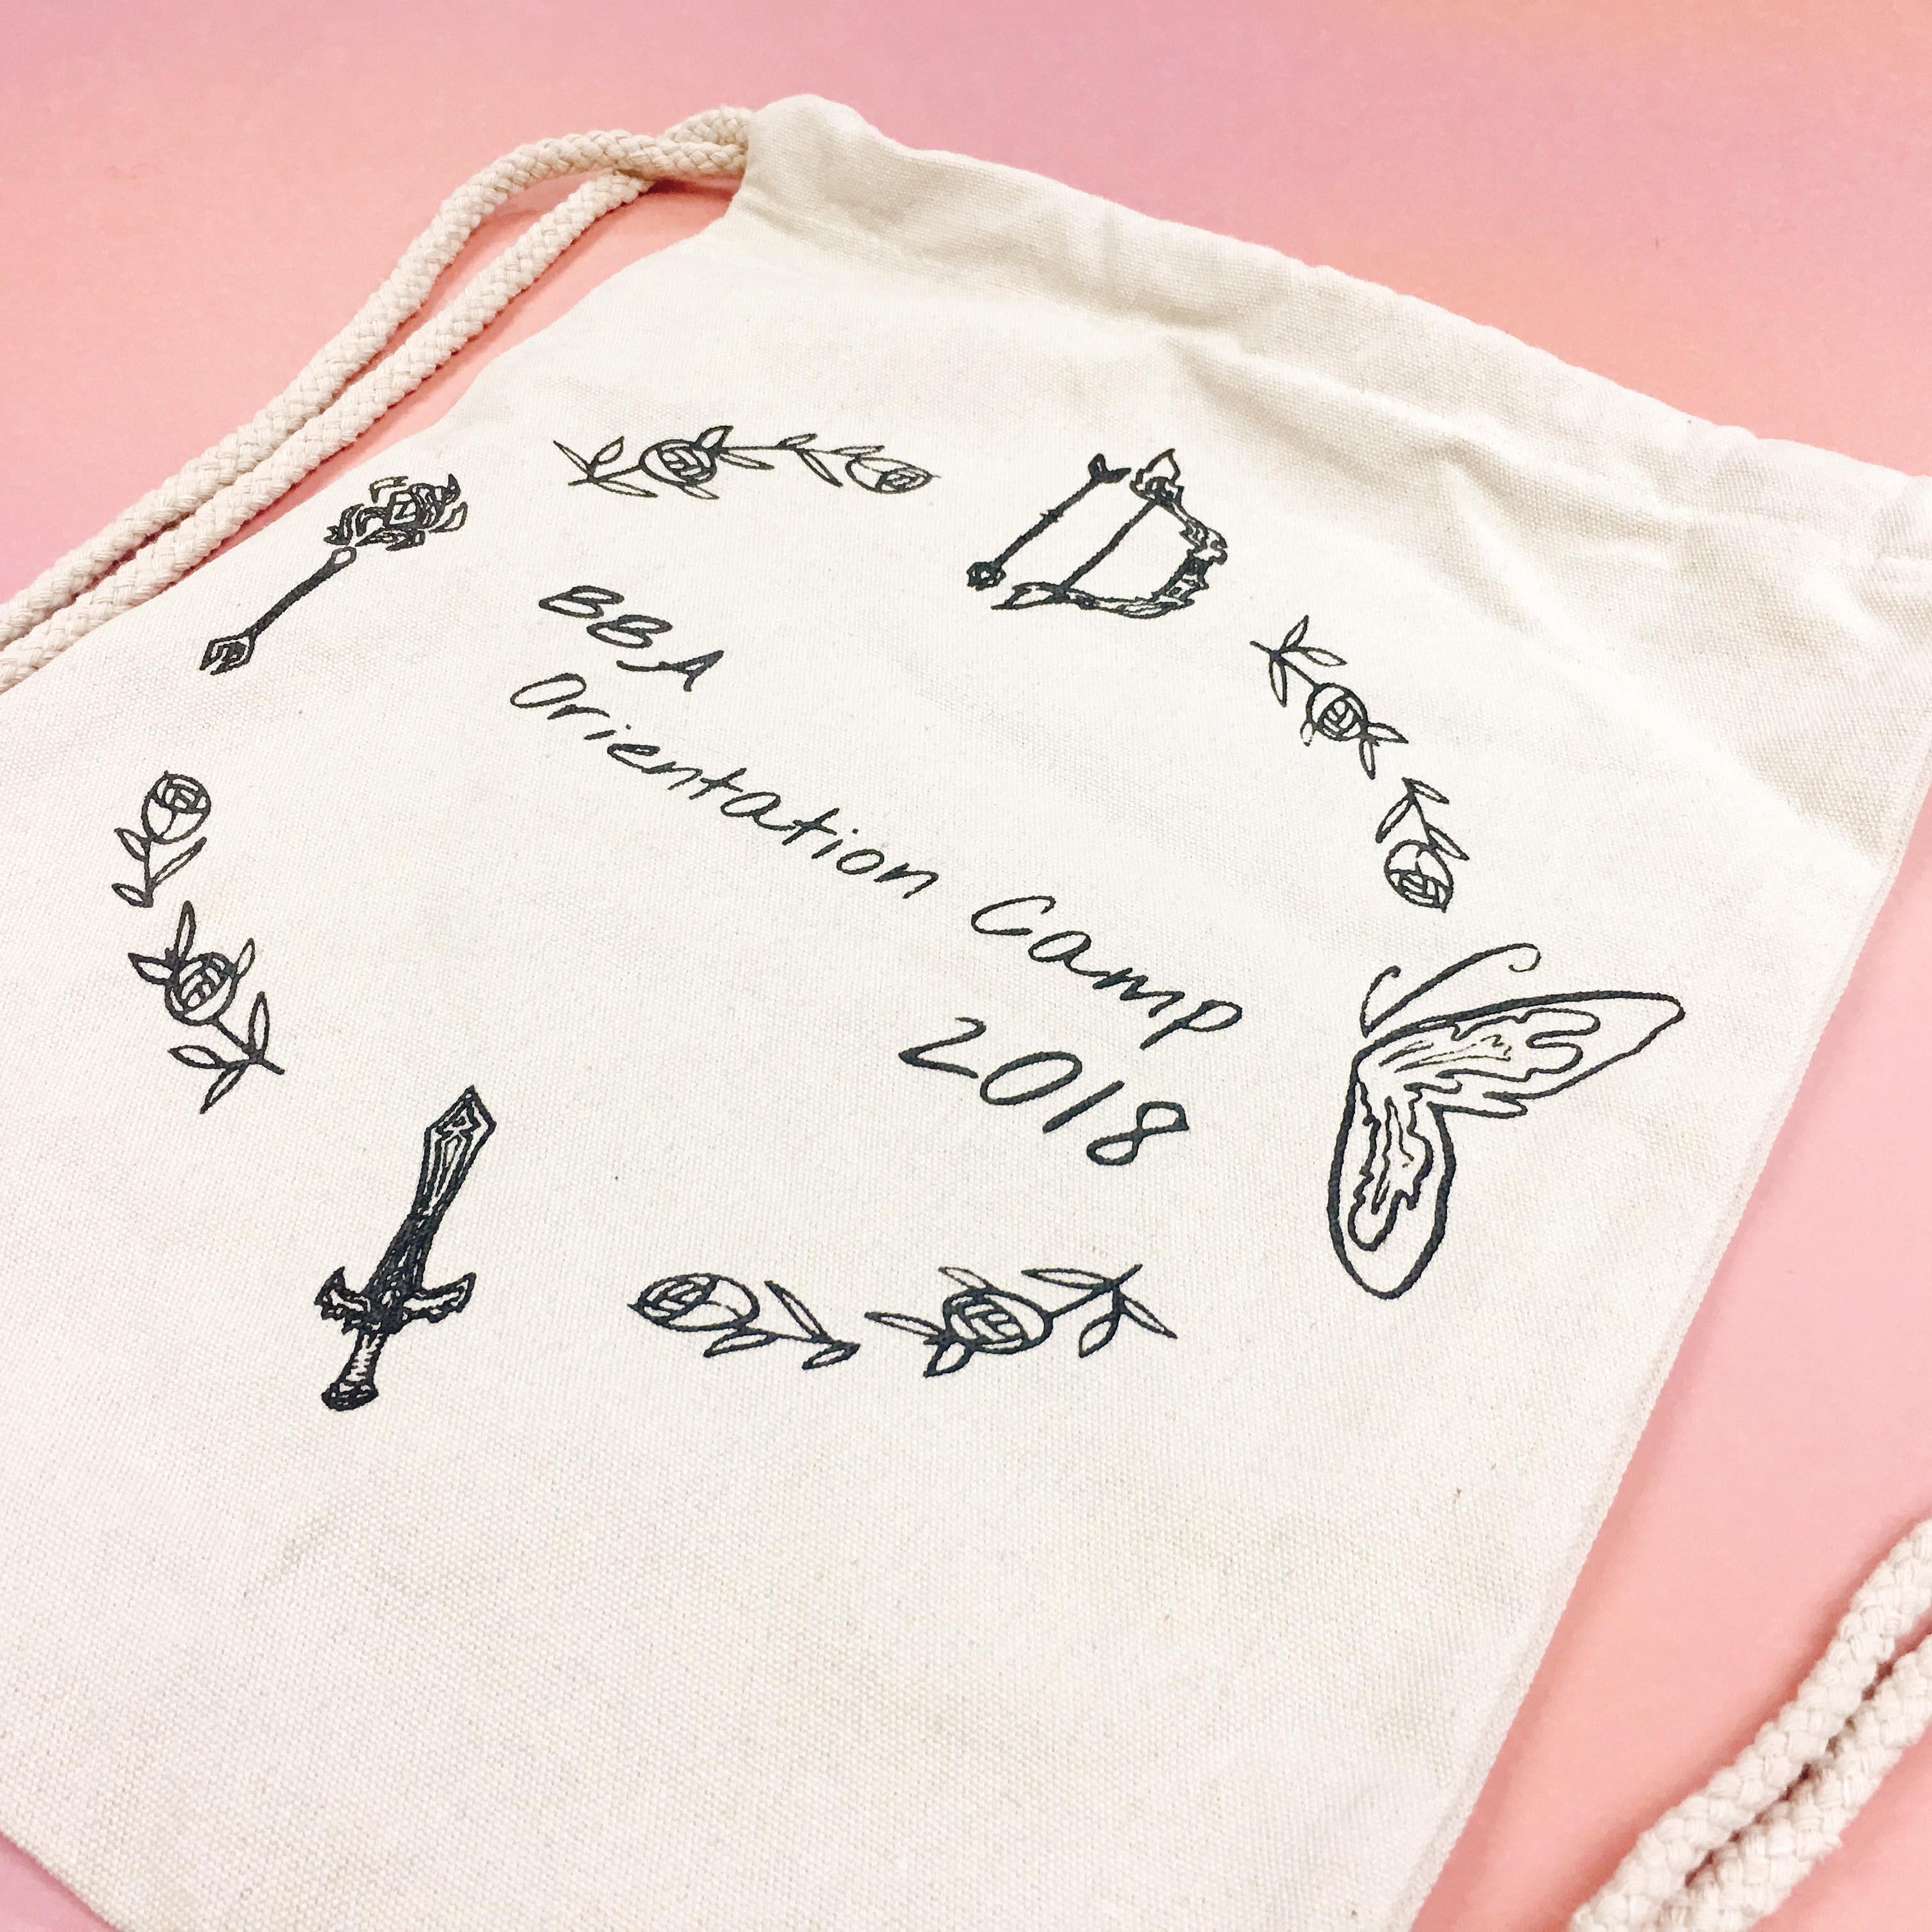 印索繩袋,訂做索袋,訂做drawstring bag